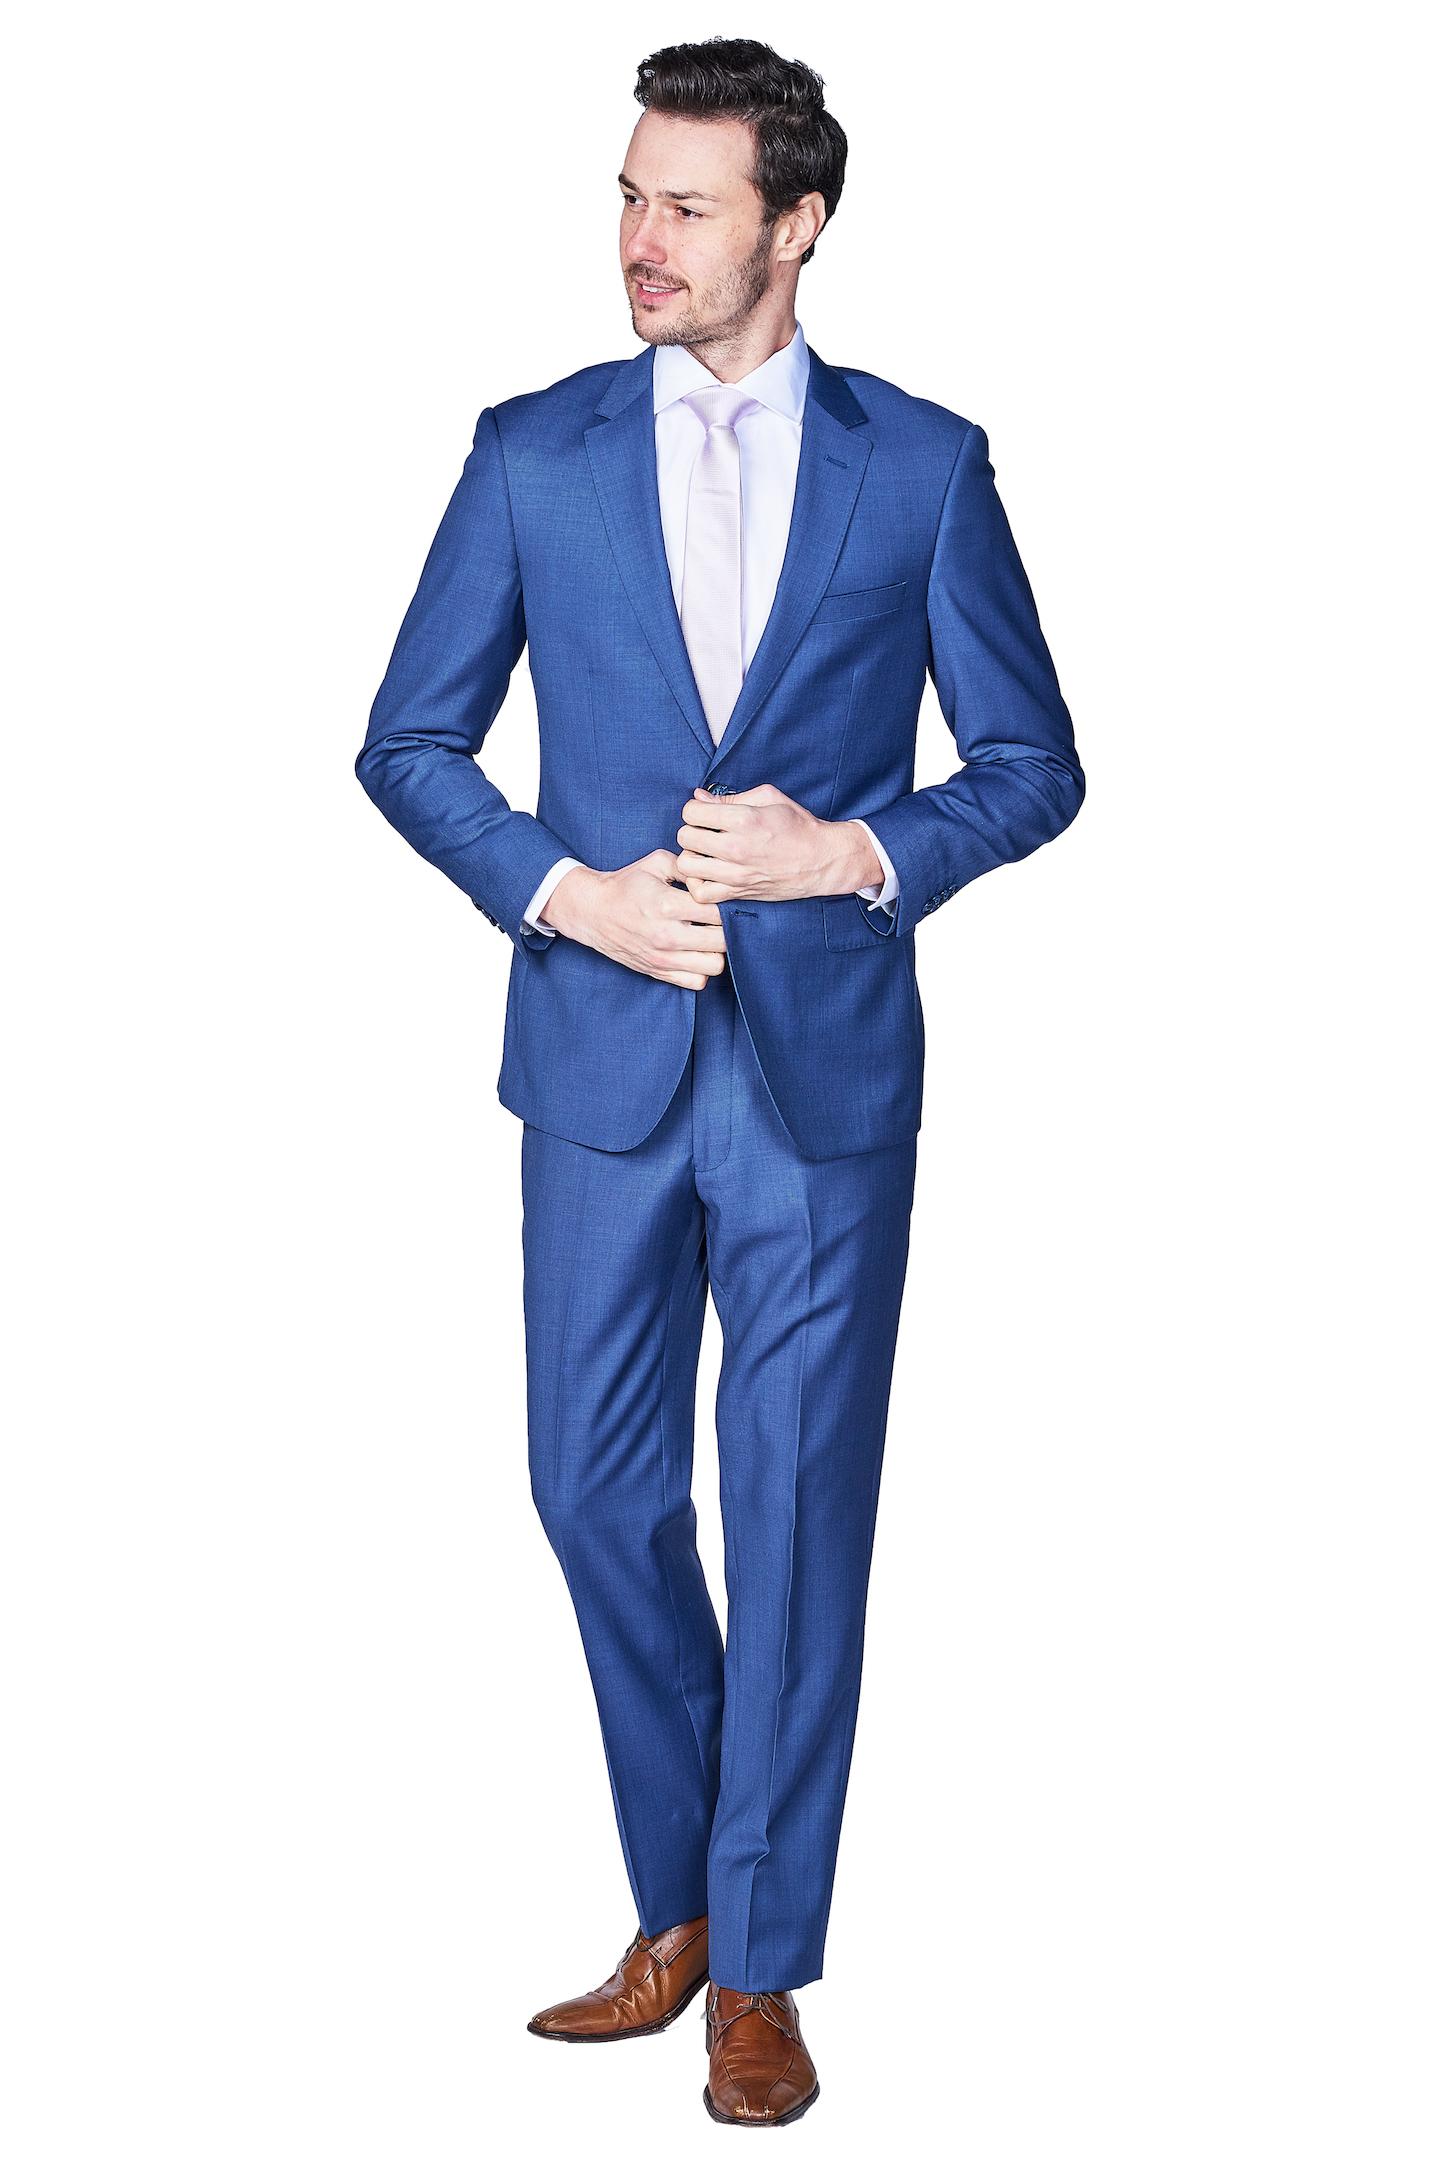 Giovanni Bresciani Royal Blue SuitGB-Royal Blue$850.00 USD.png